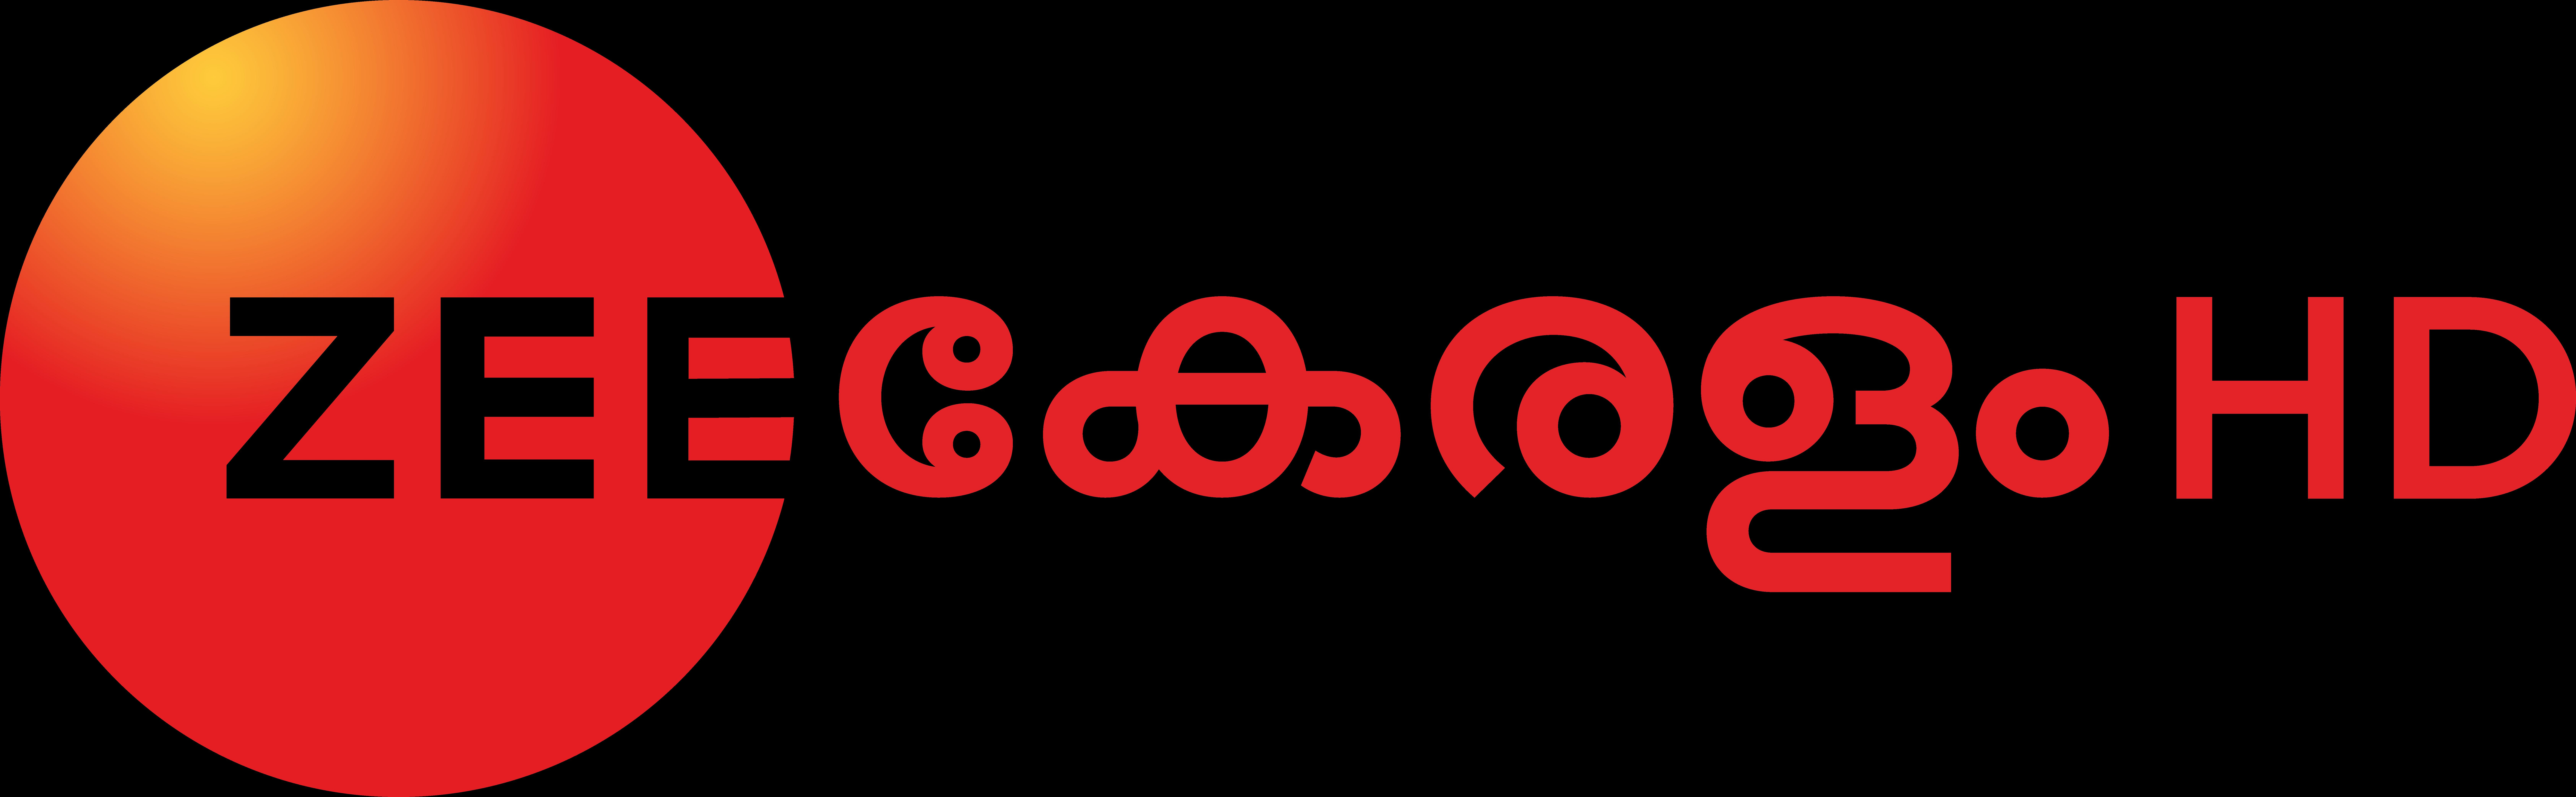 Nandanandanam Serial Online Episodes Available At Zee5 App